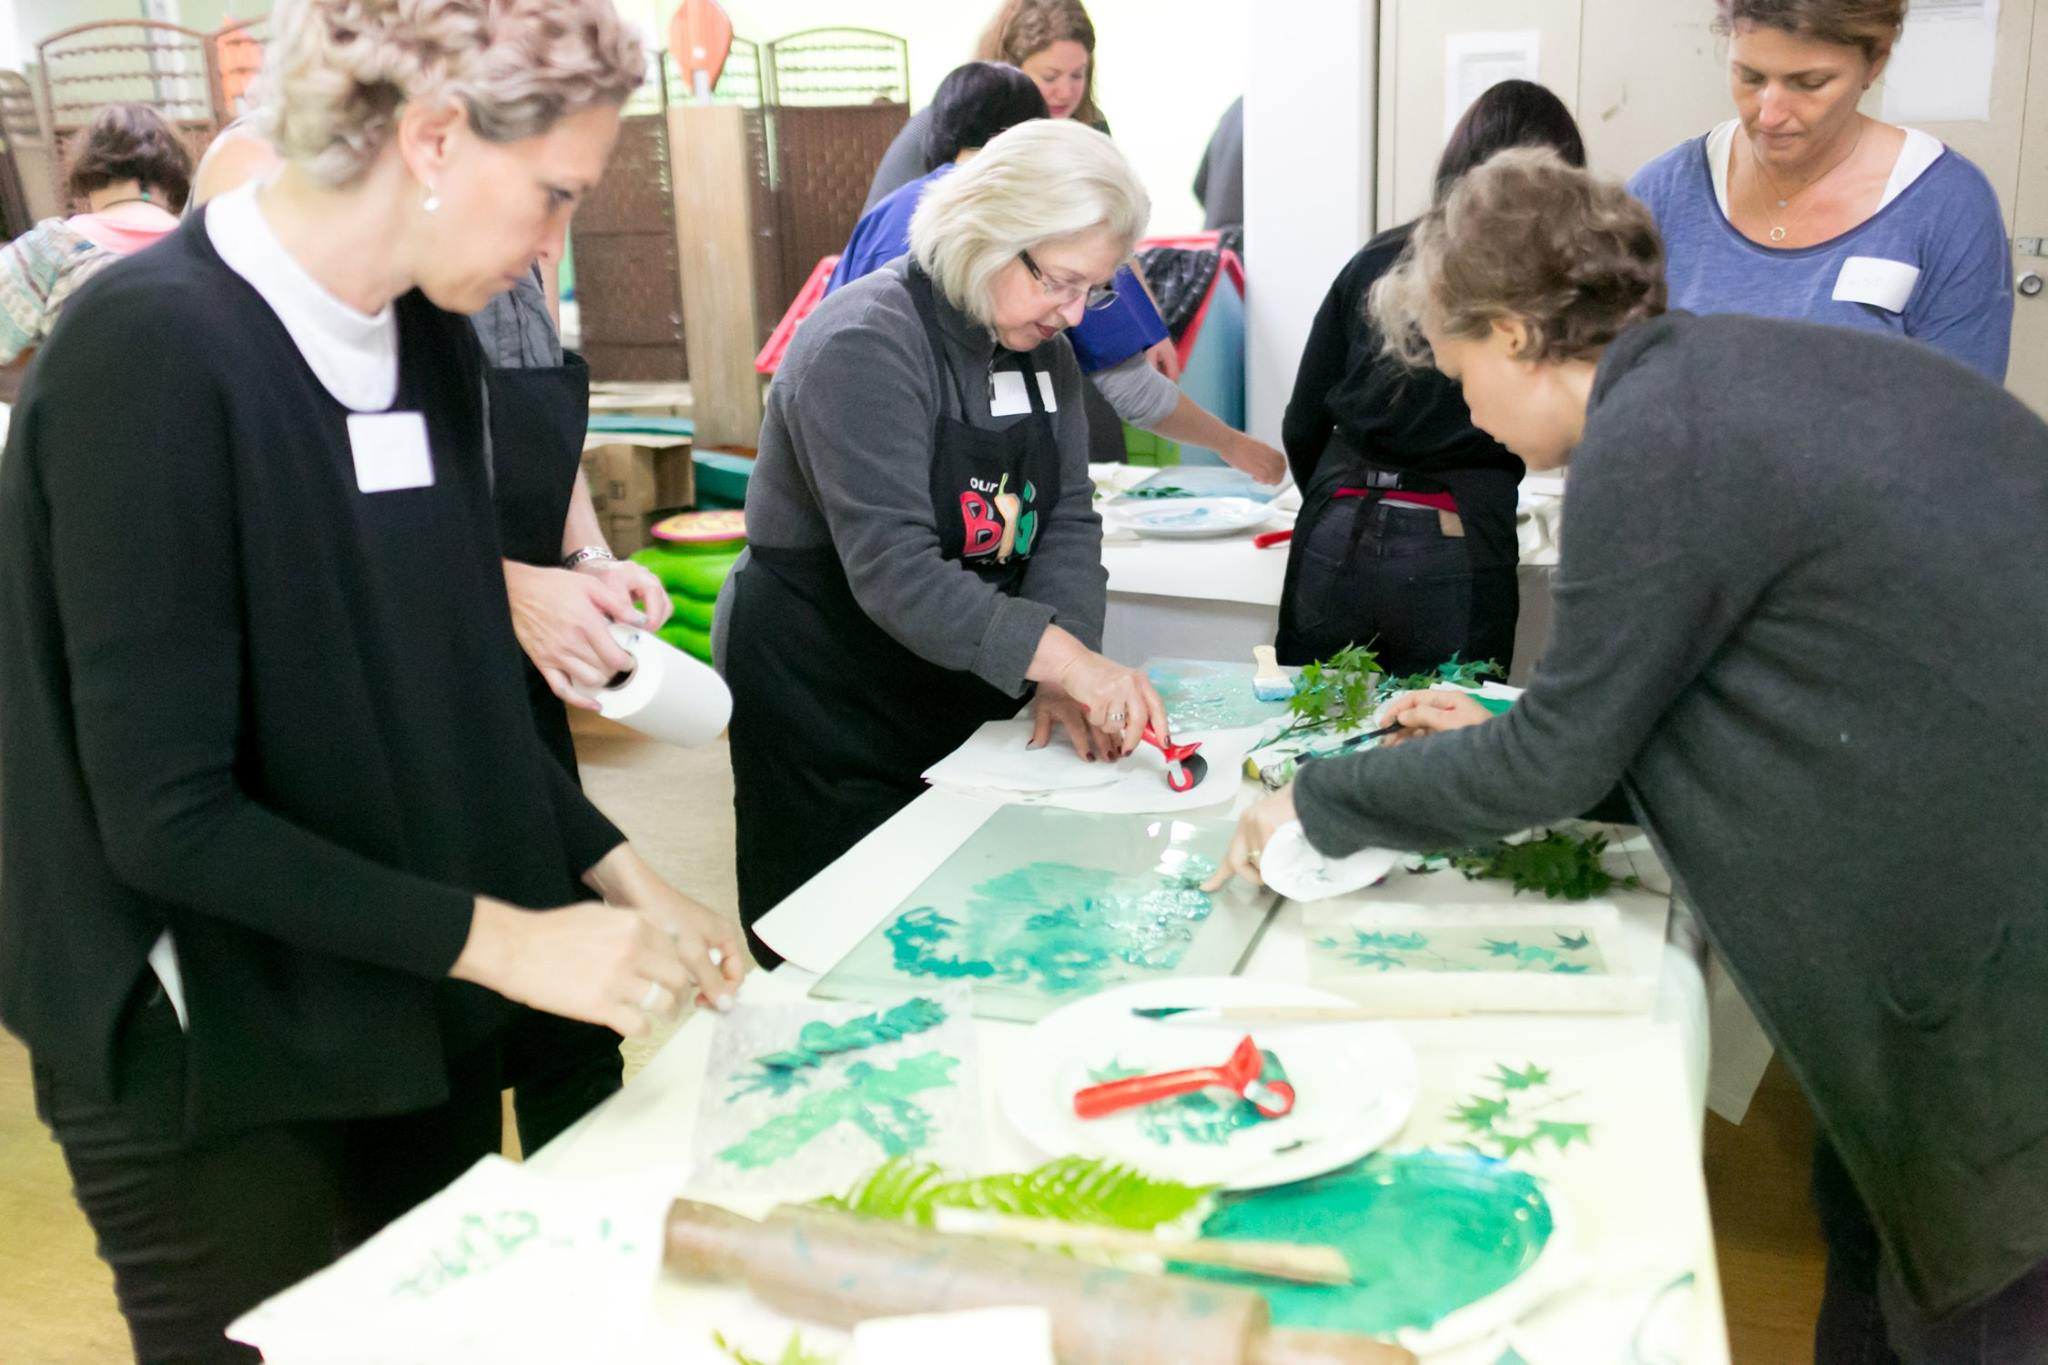 Creative workshop facilitated by artist Louise Trevitt